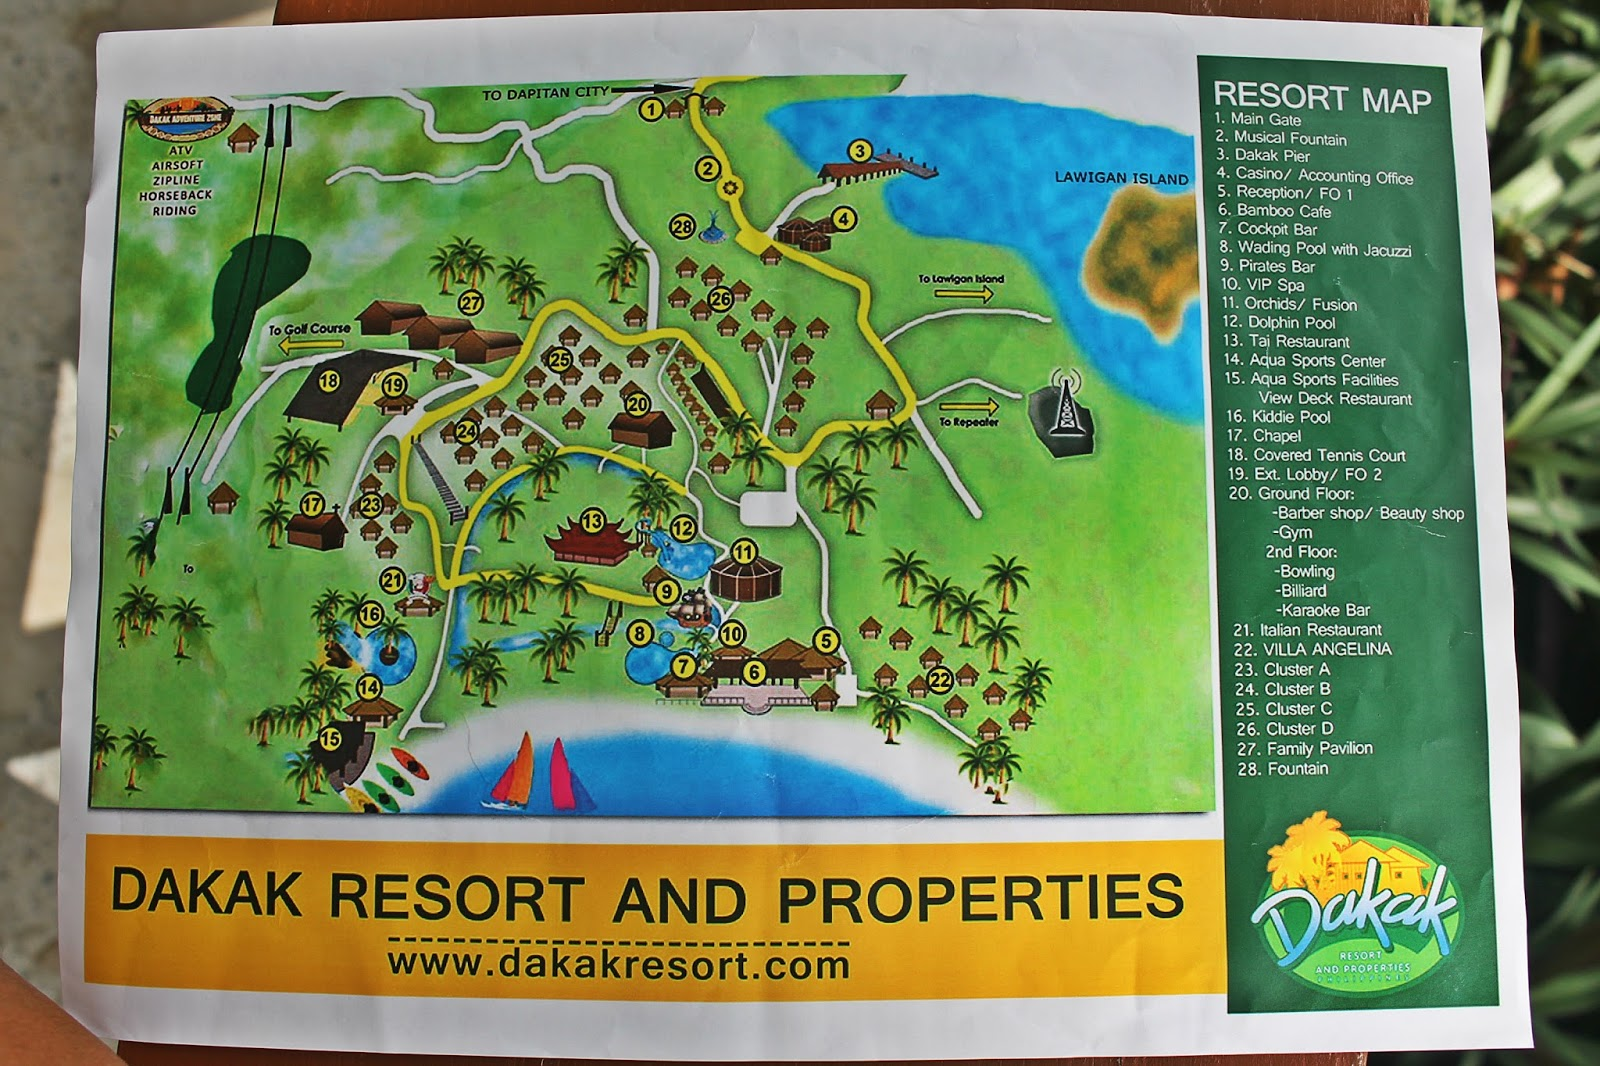 elles tinker toes  Dapitan City  Day 3  4  Dakak Park